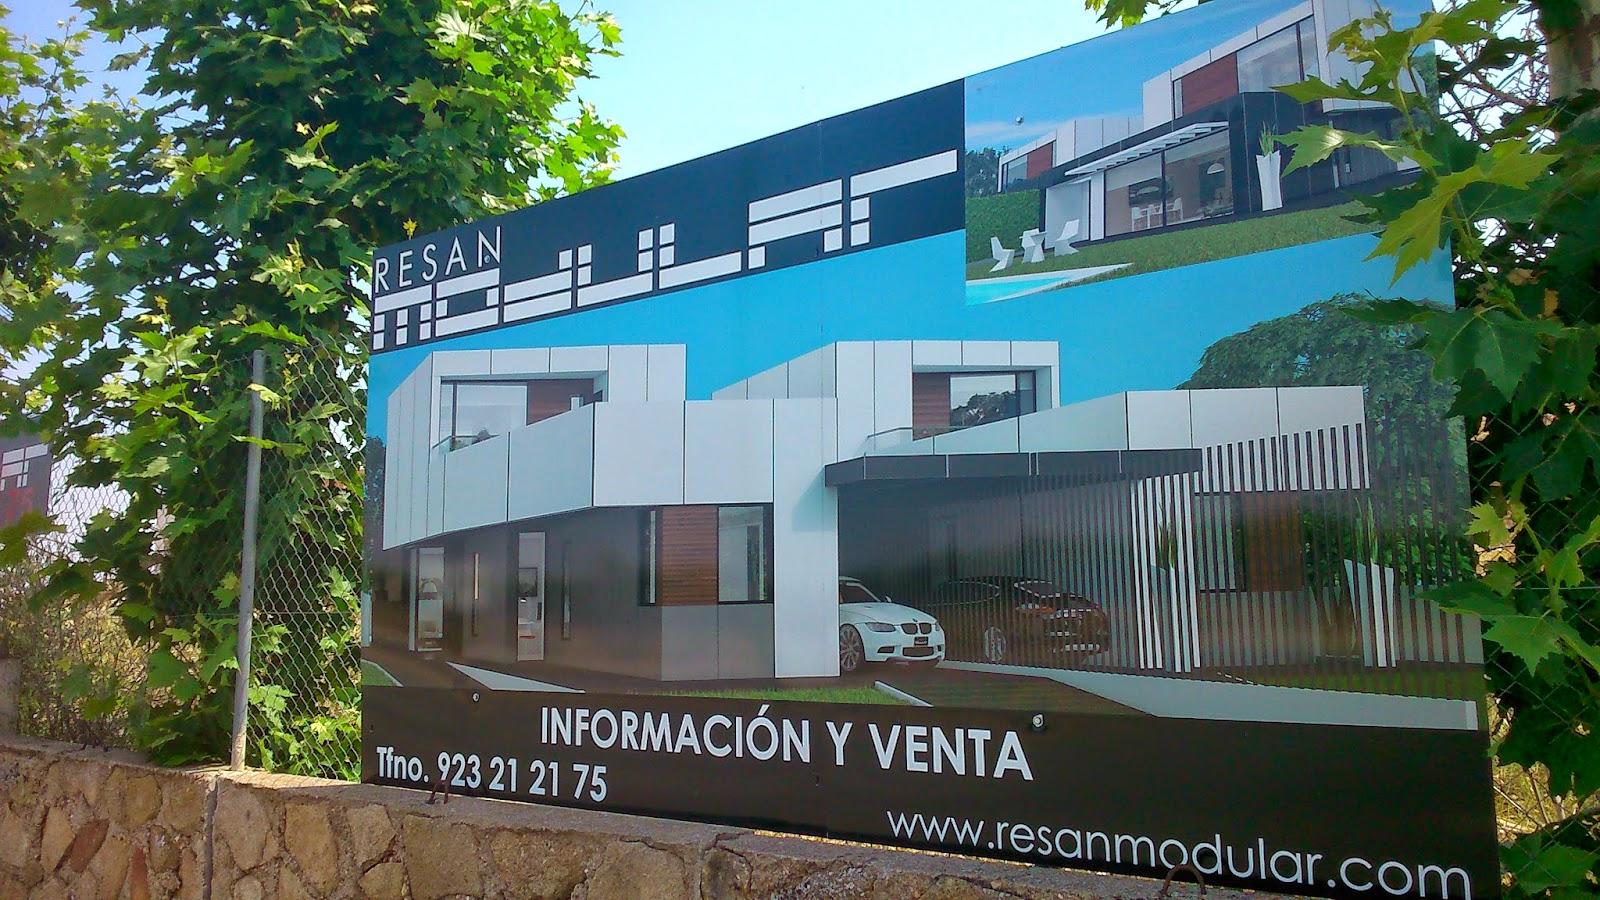 Cartel promoción viviendas campo de golf de Villamayor de Resan Modular